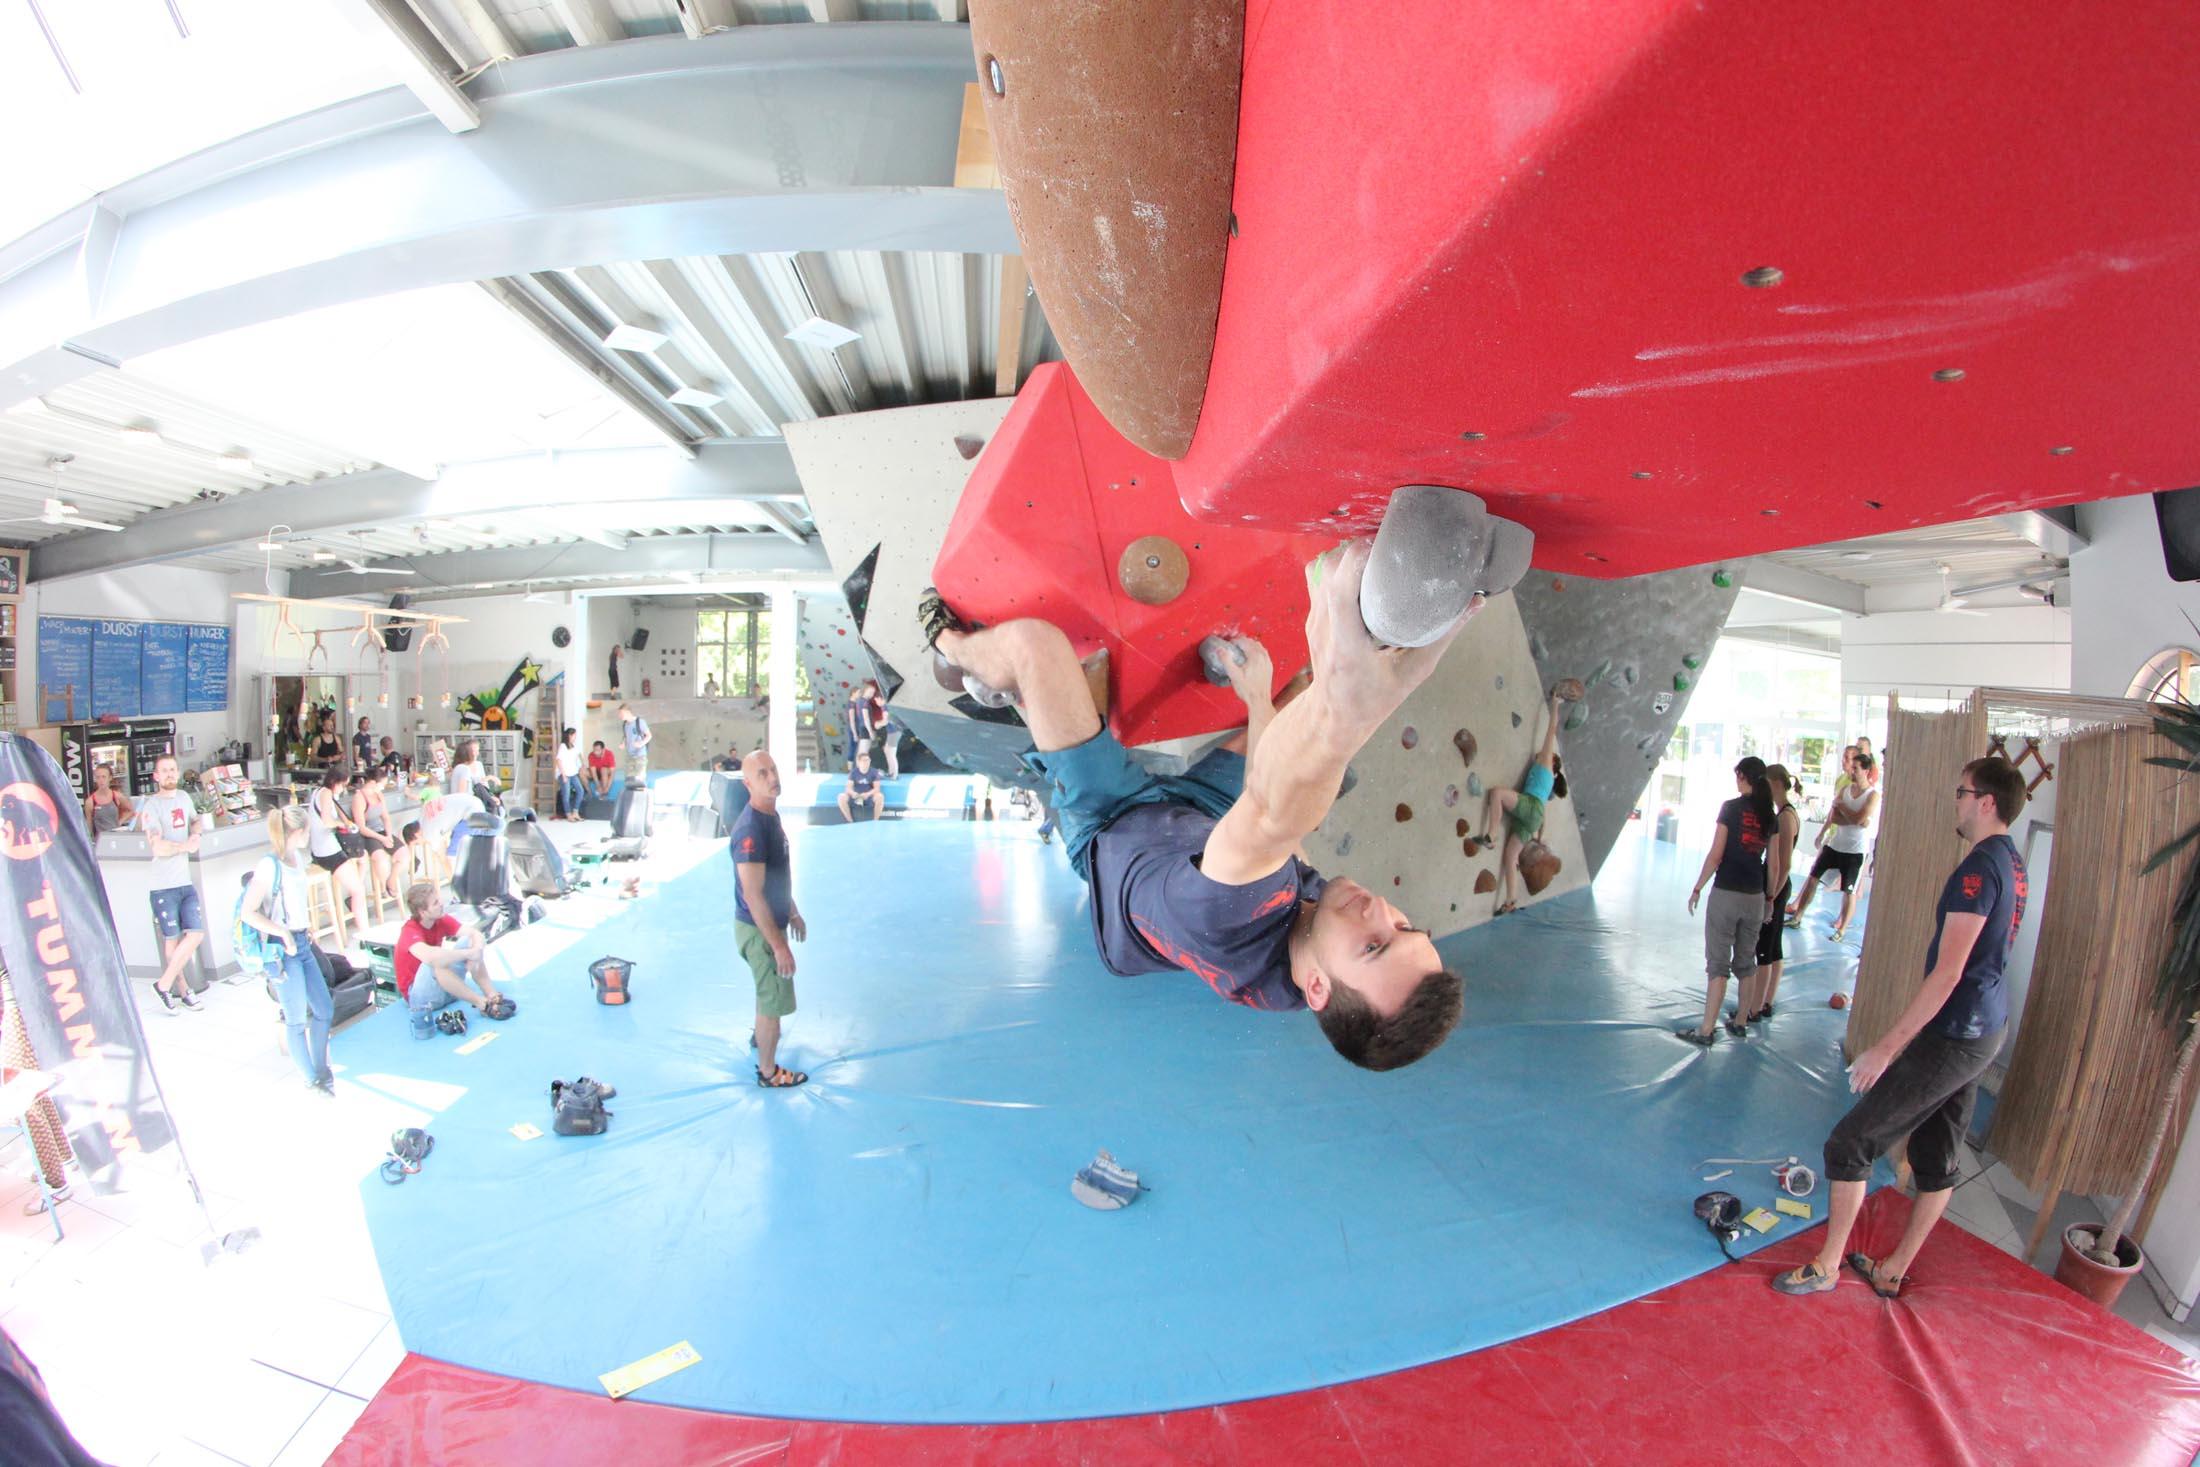 Quali, internationaler bouldercup Frankenjura 2016, BLOCKHELDEN Erlangen, Mammut, Bergfreunde.de, Boulderwettkampf07092016120